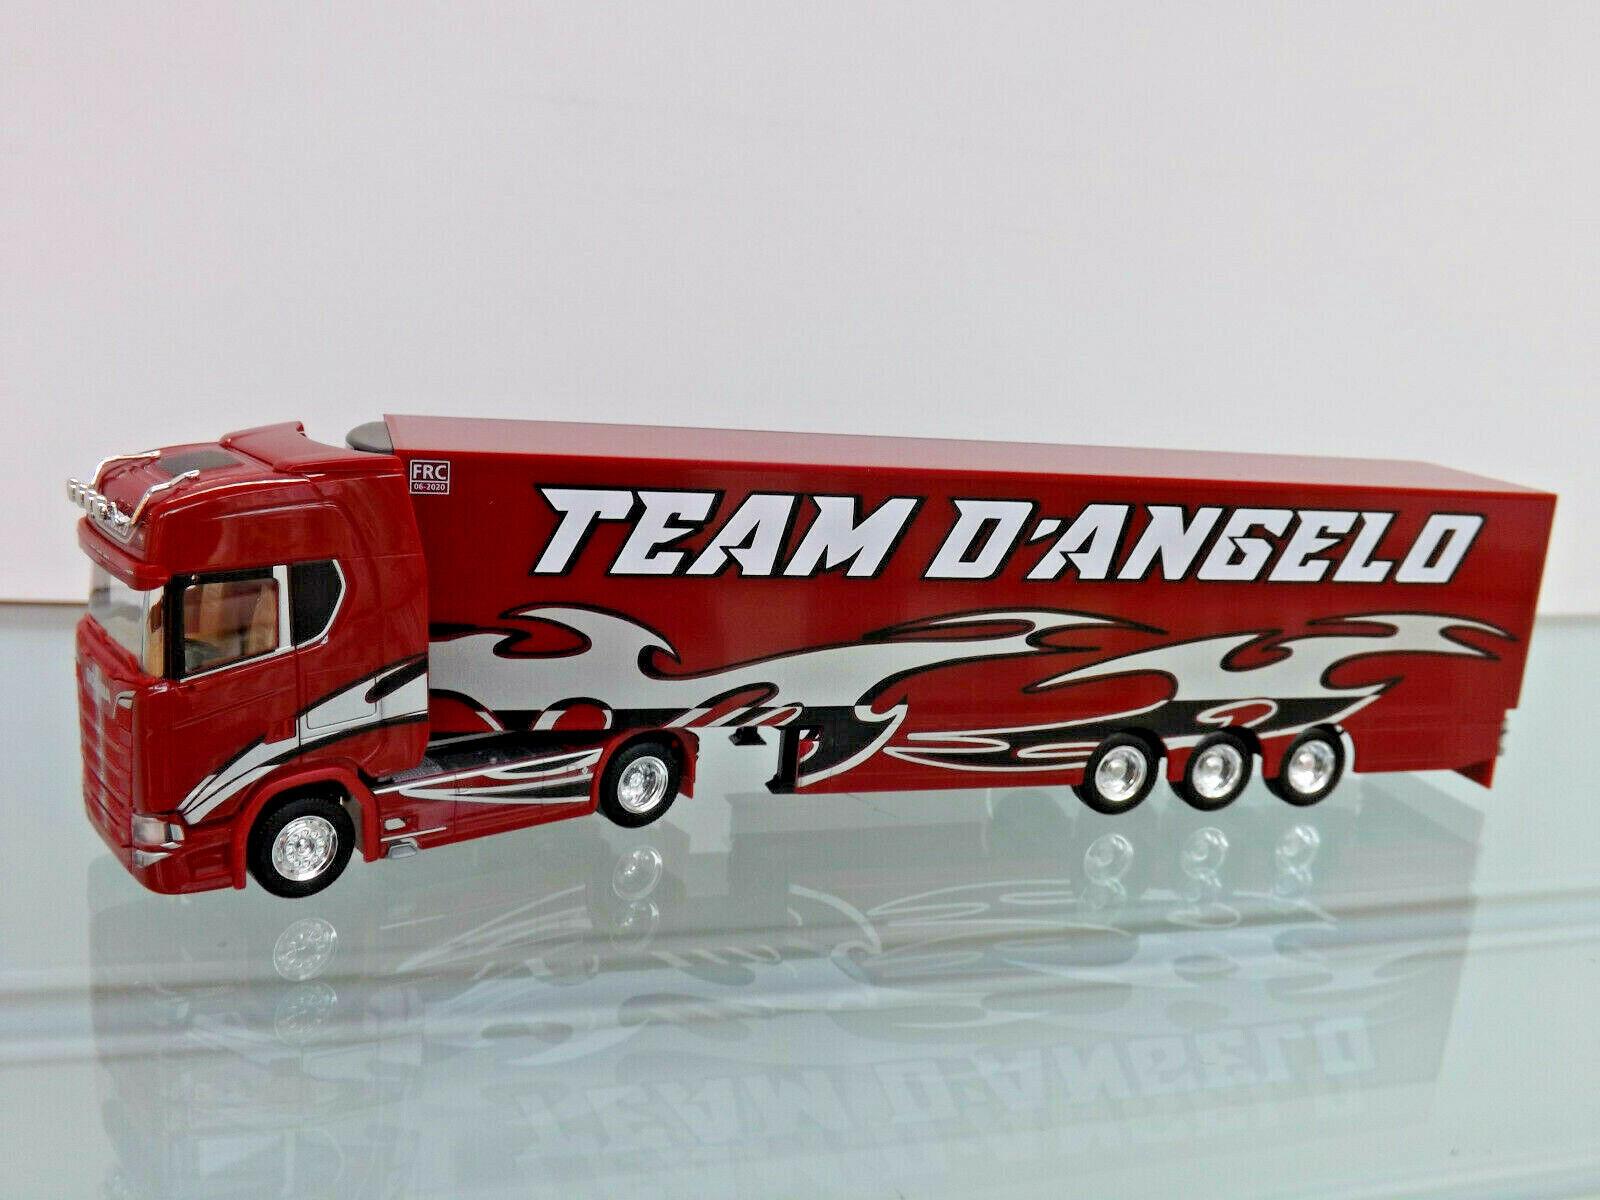 Herpa 309929 - 1 87 - Scania CS 20 HIGH ROOF FRIDGE SUITCASE-sz  Team d' Angelo  - NEW